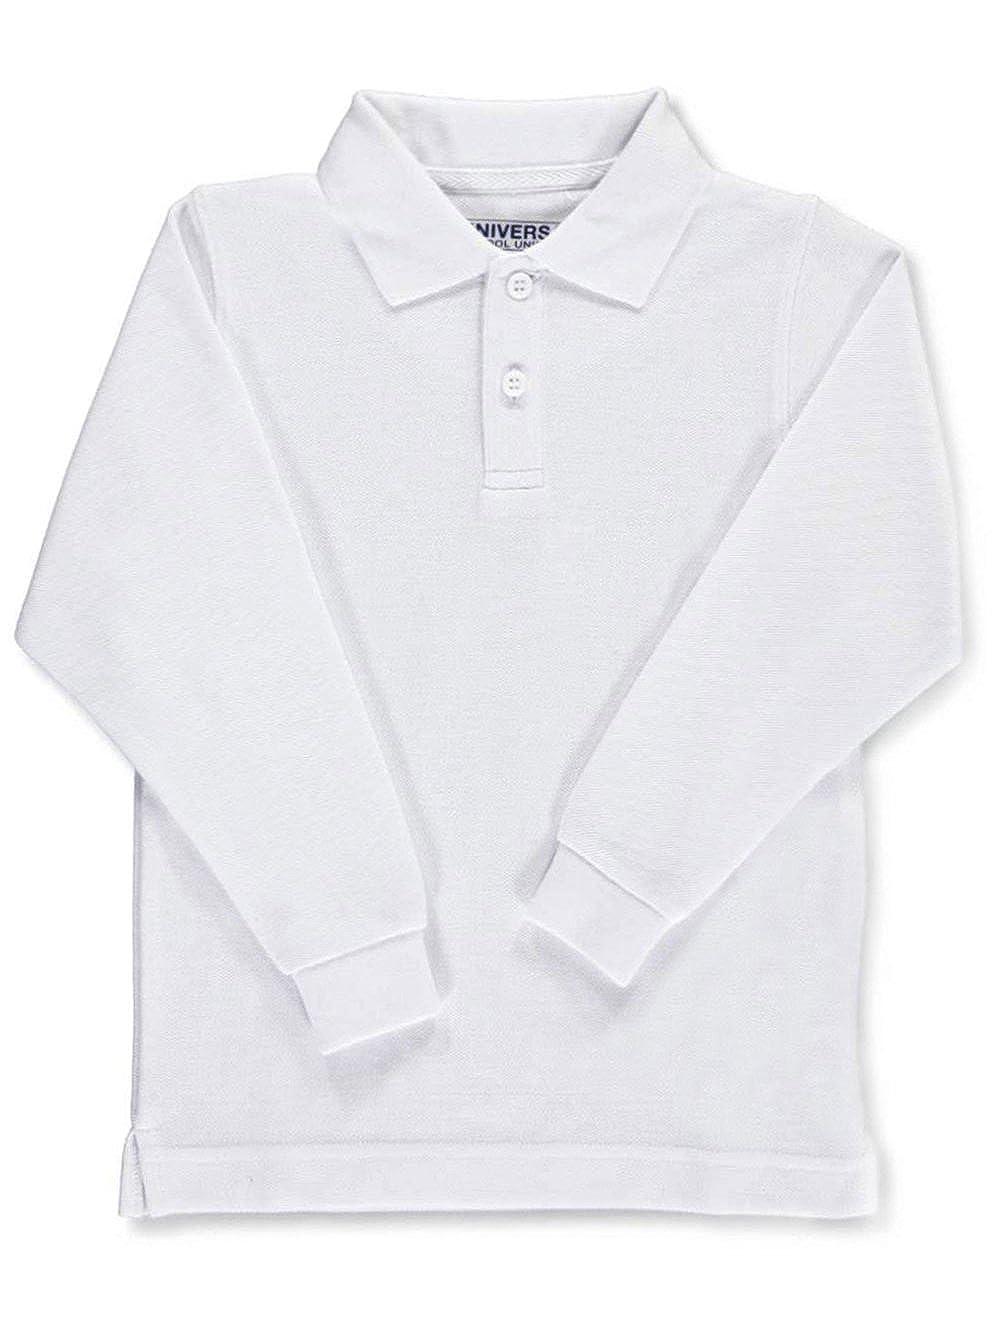 Universal Unisex L/S Pique Polo - white, 14